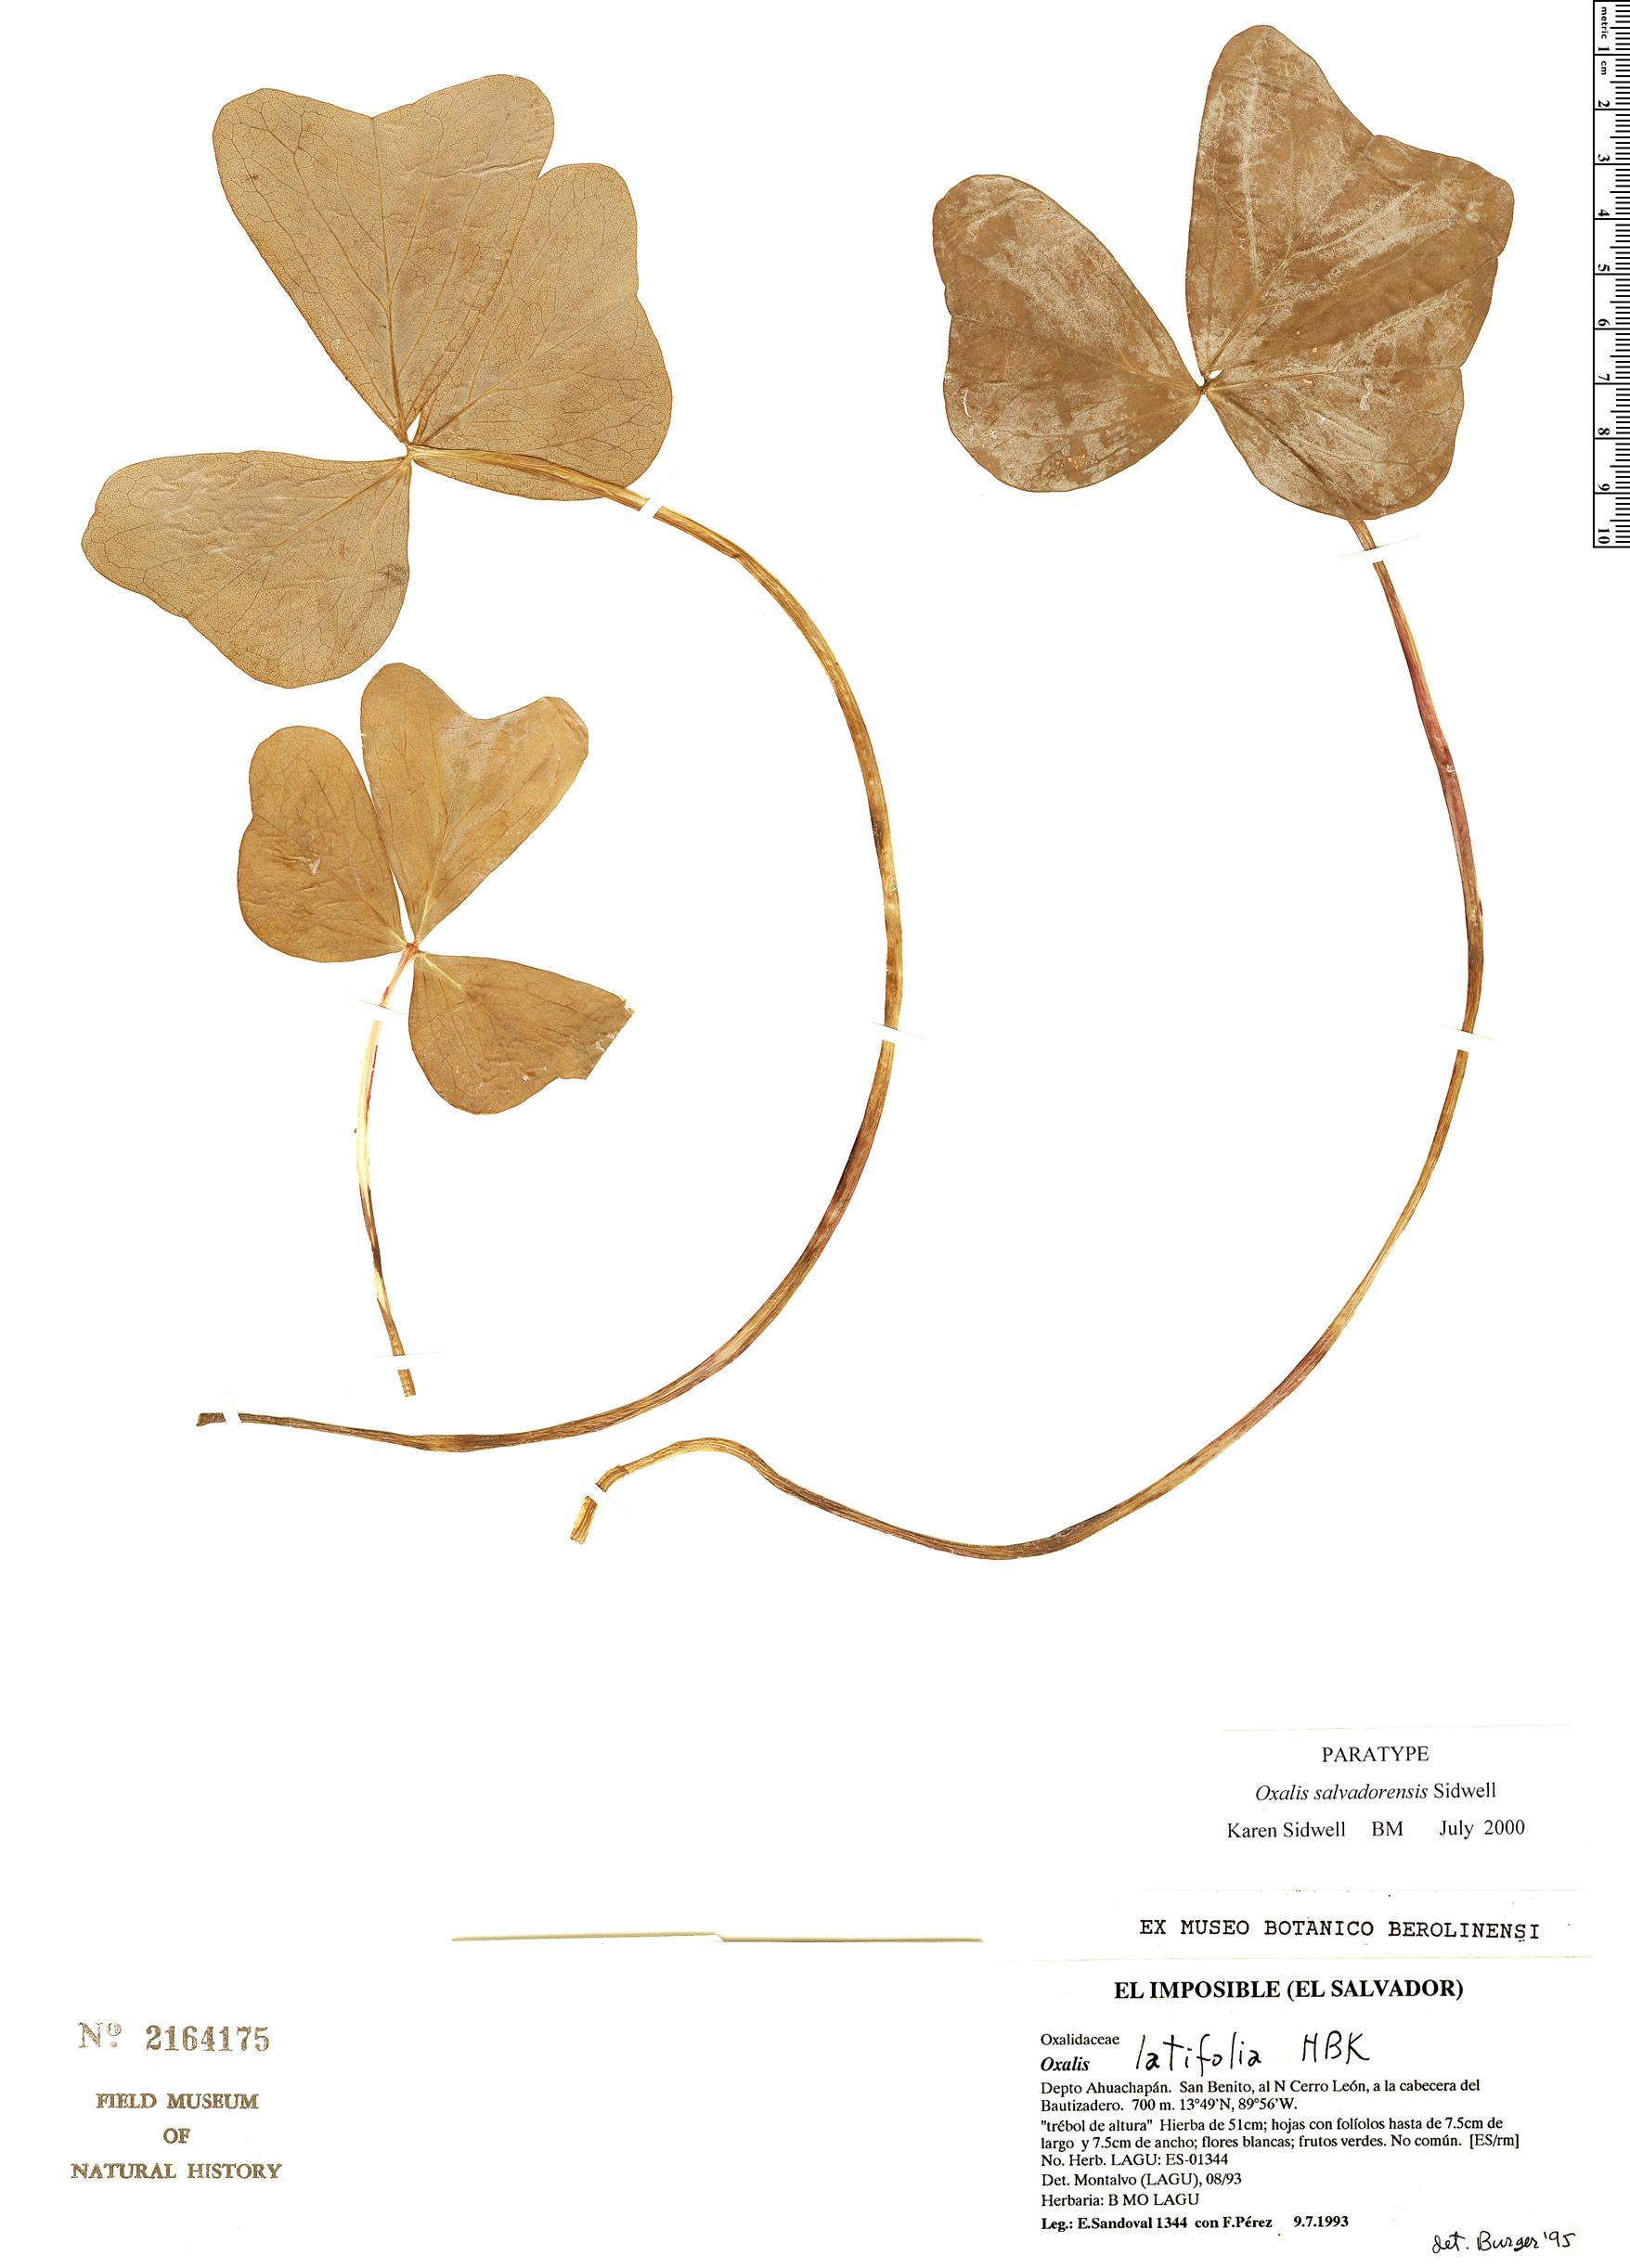 Specimen: Oxalis salvadorensis